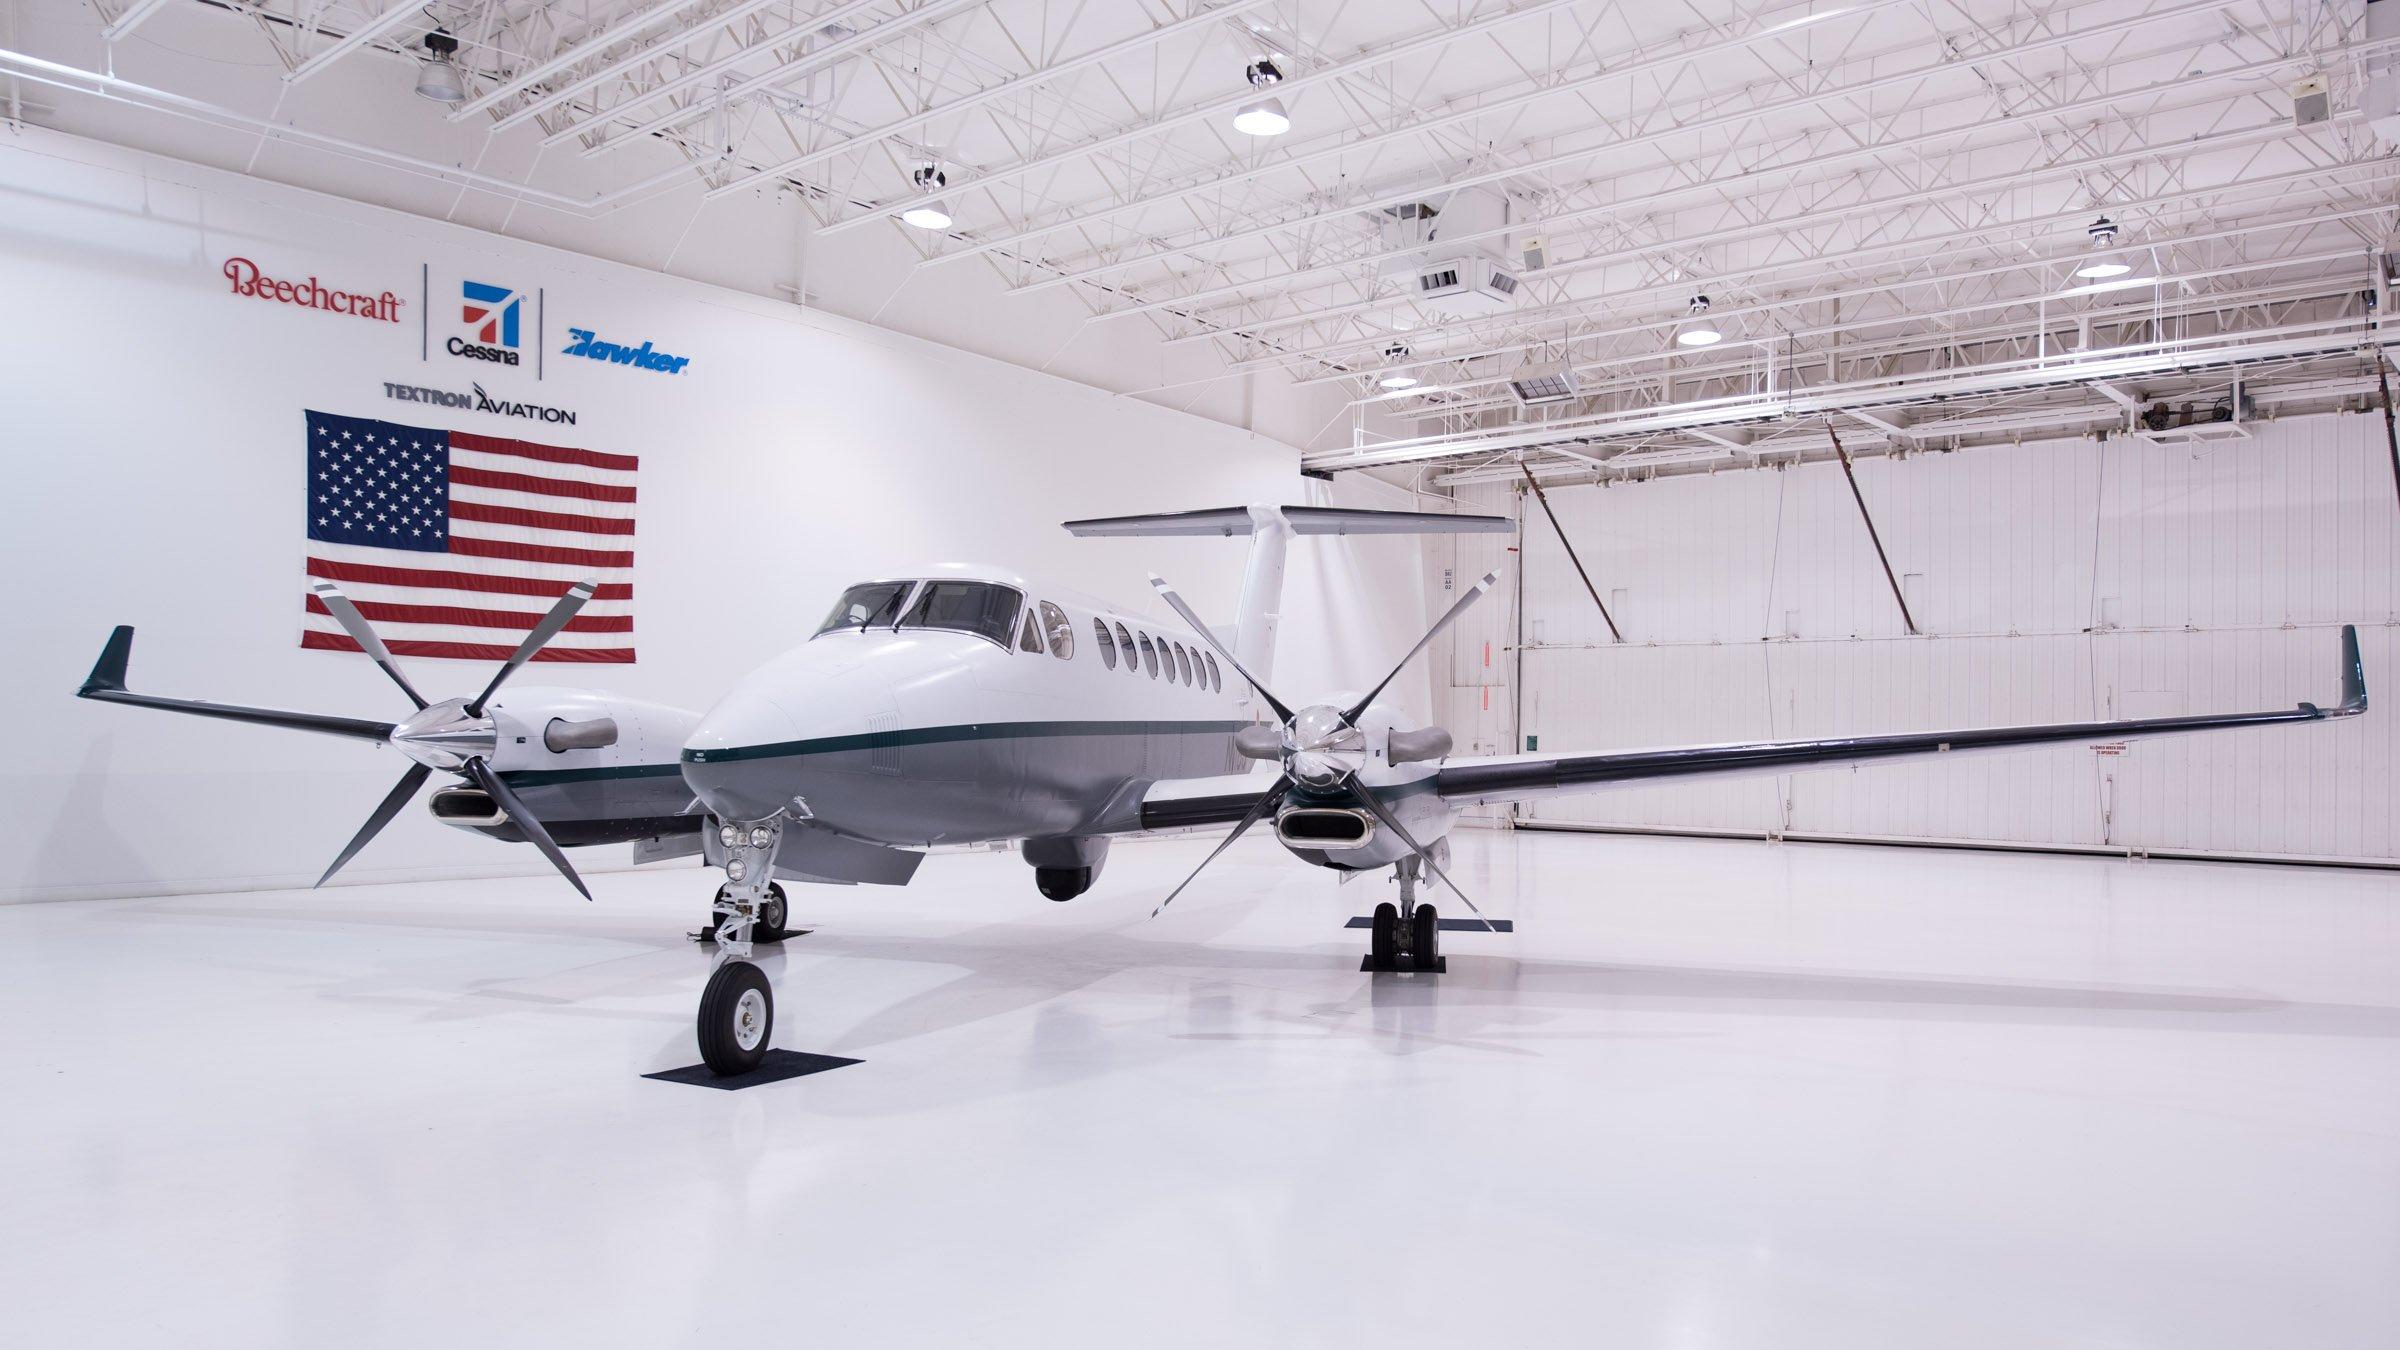 King Air 350i [Textron Aviation]